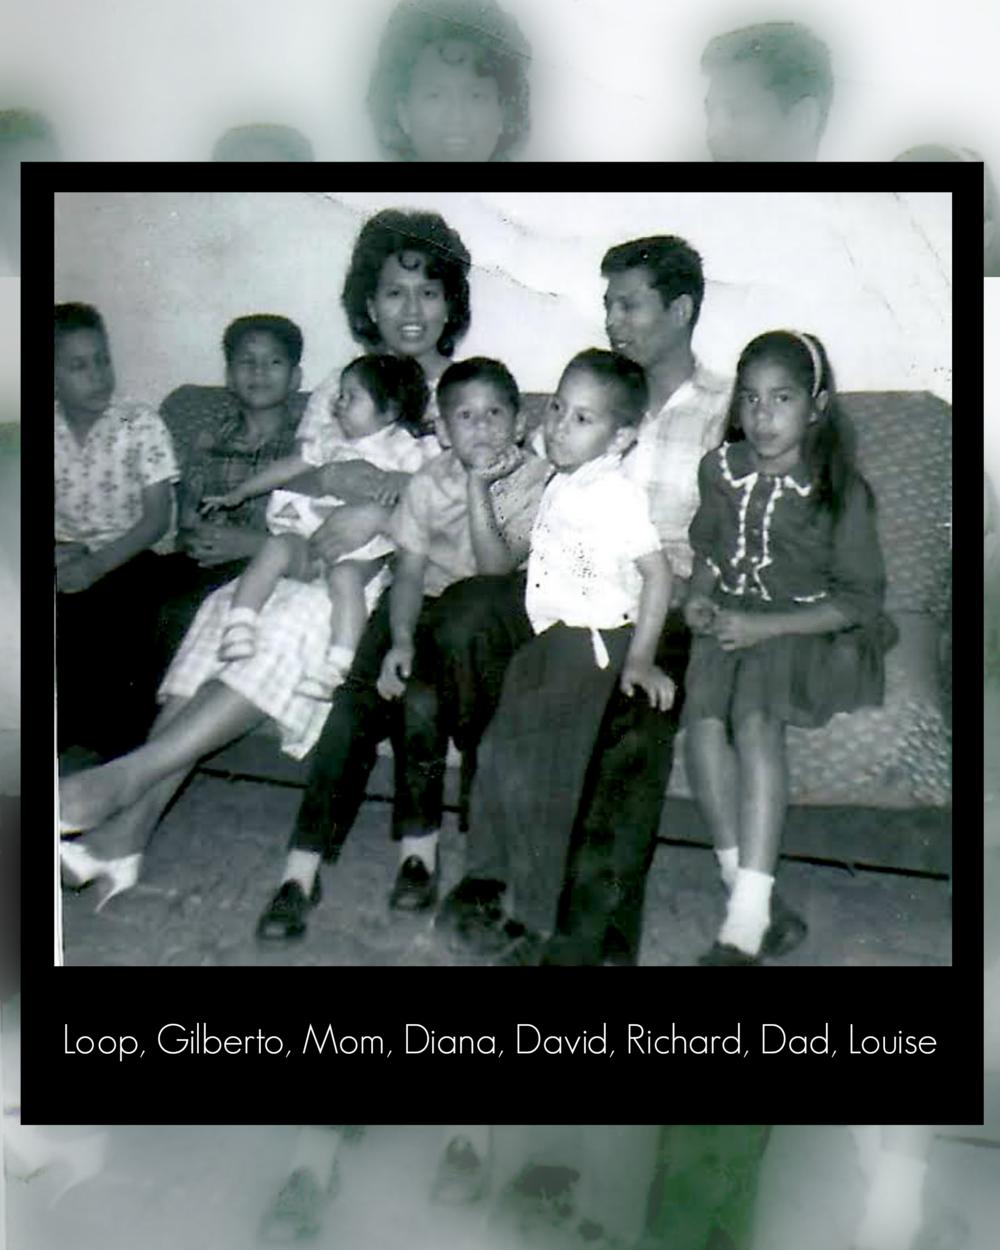 The Espinoza family in the 1960s.